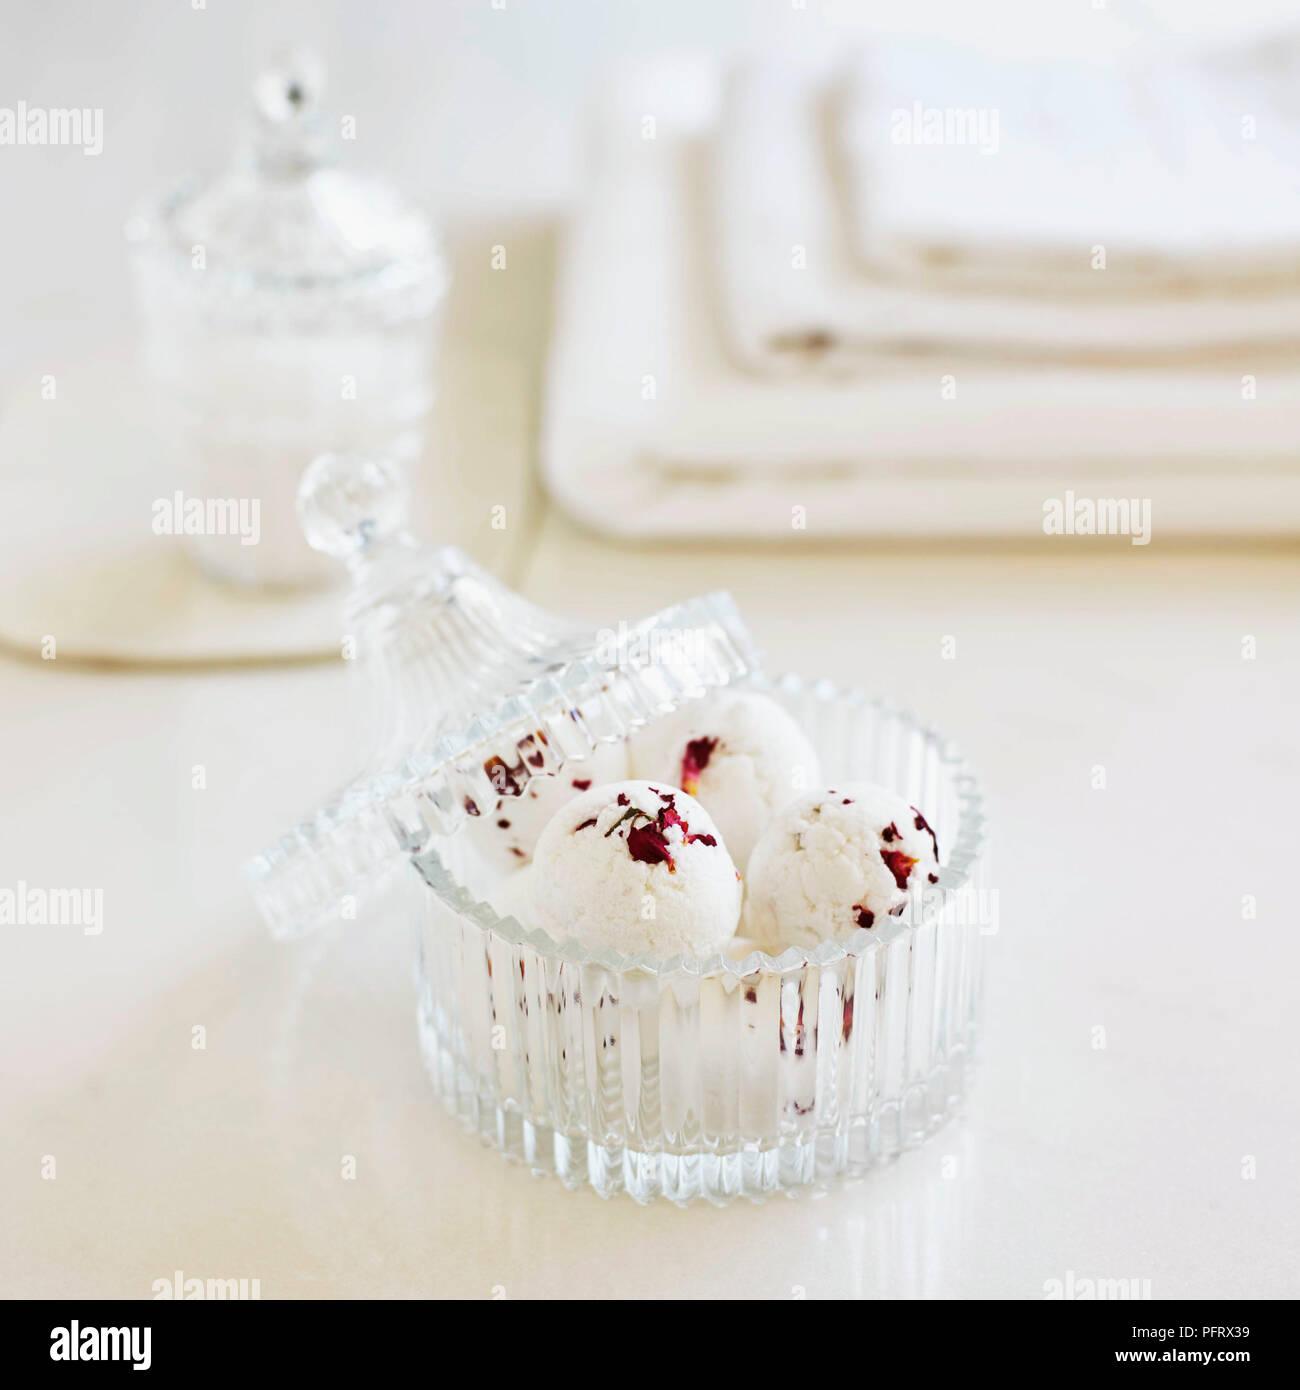 Rose bath bombs - Stock Image